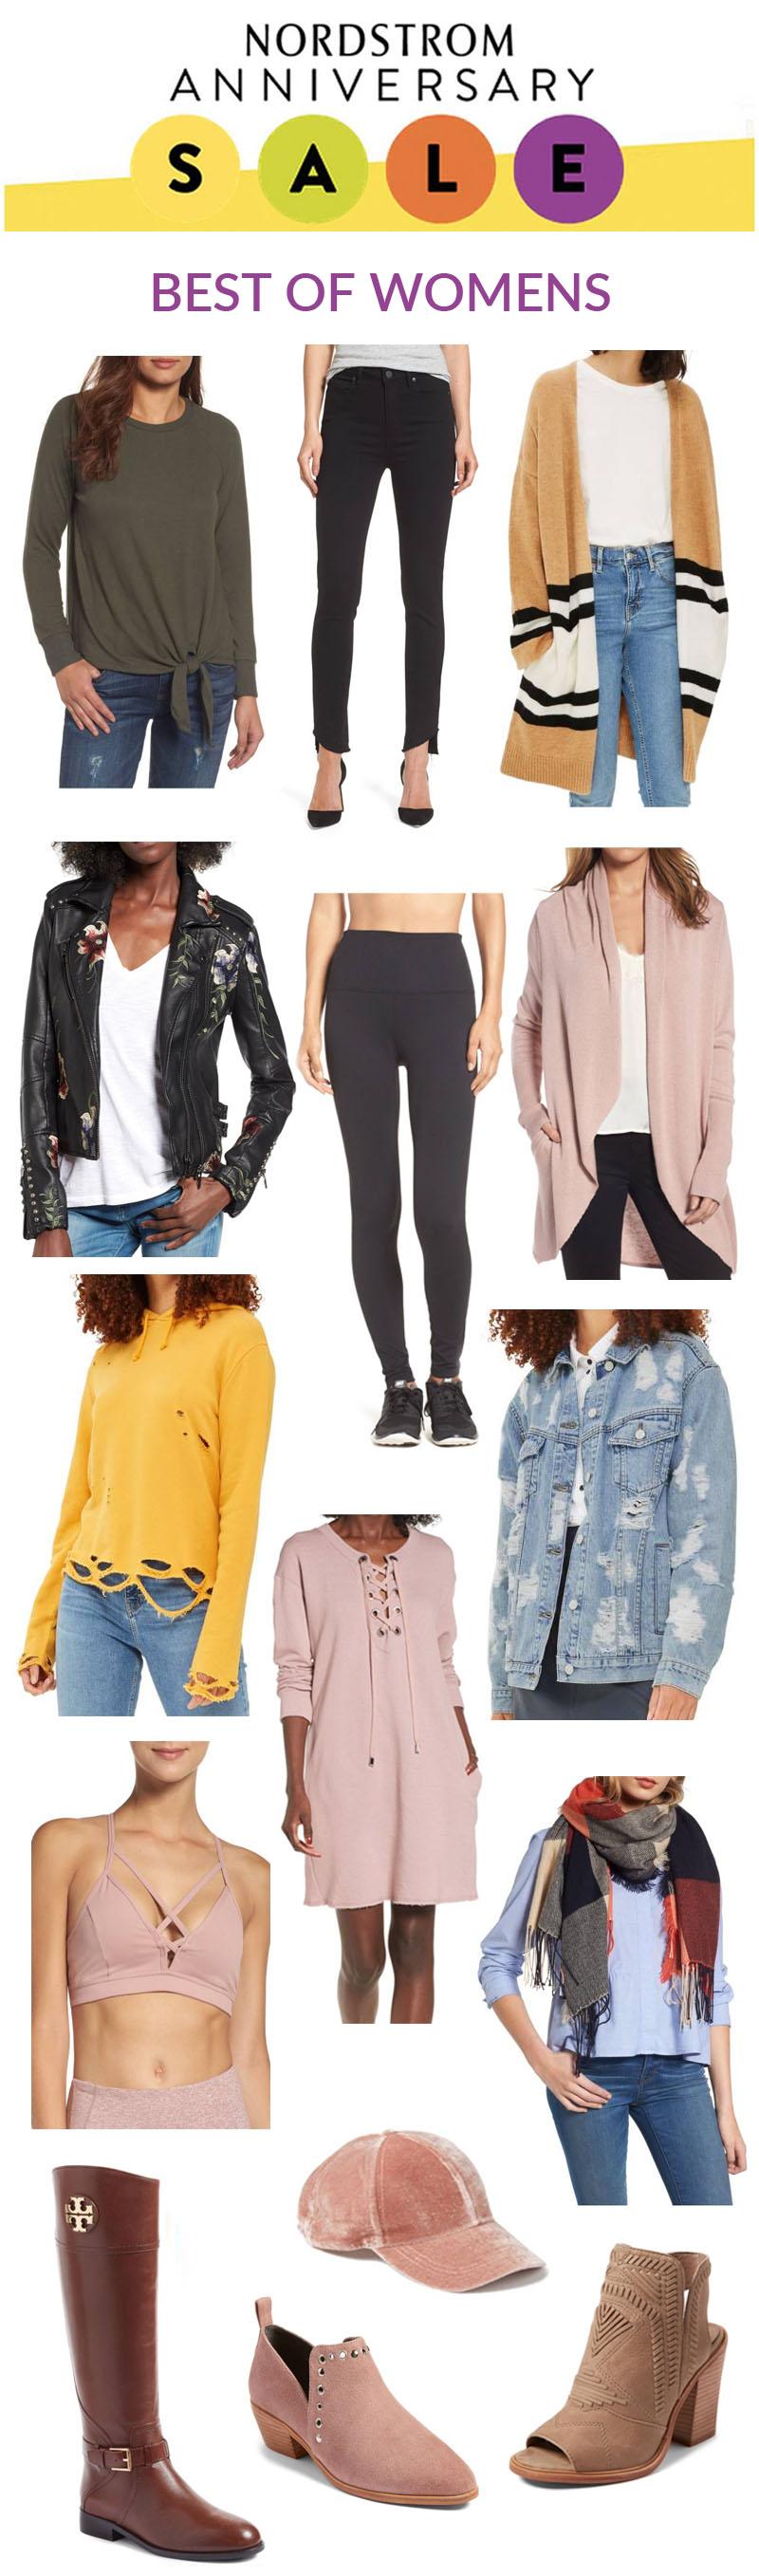 Nordstrom Sale 2017: Women's Fashion Must Haves by Utah fashion blogger Sandy A La Mode